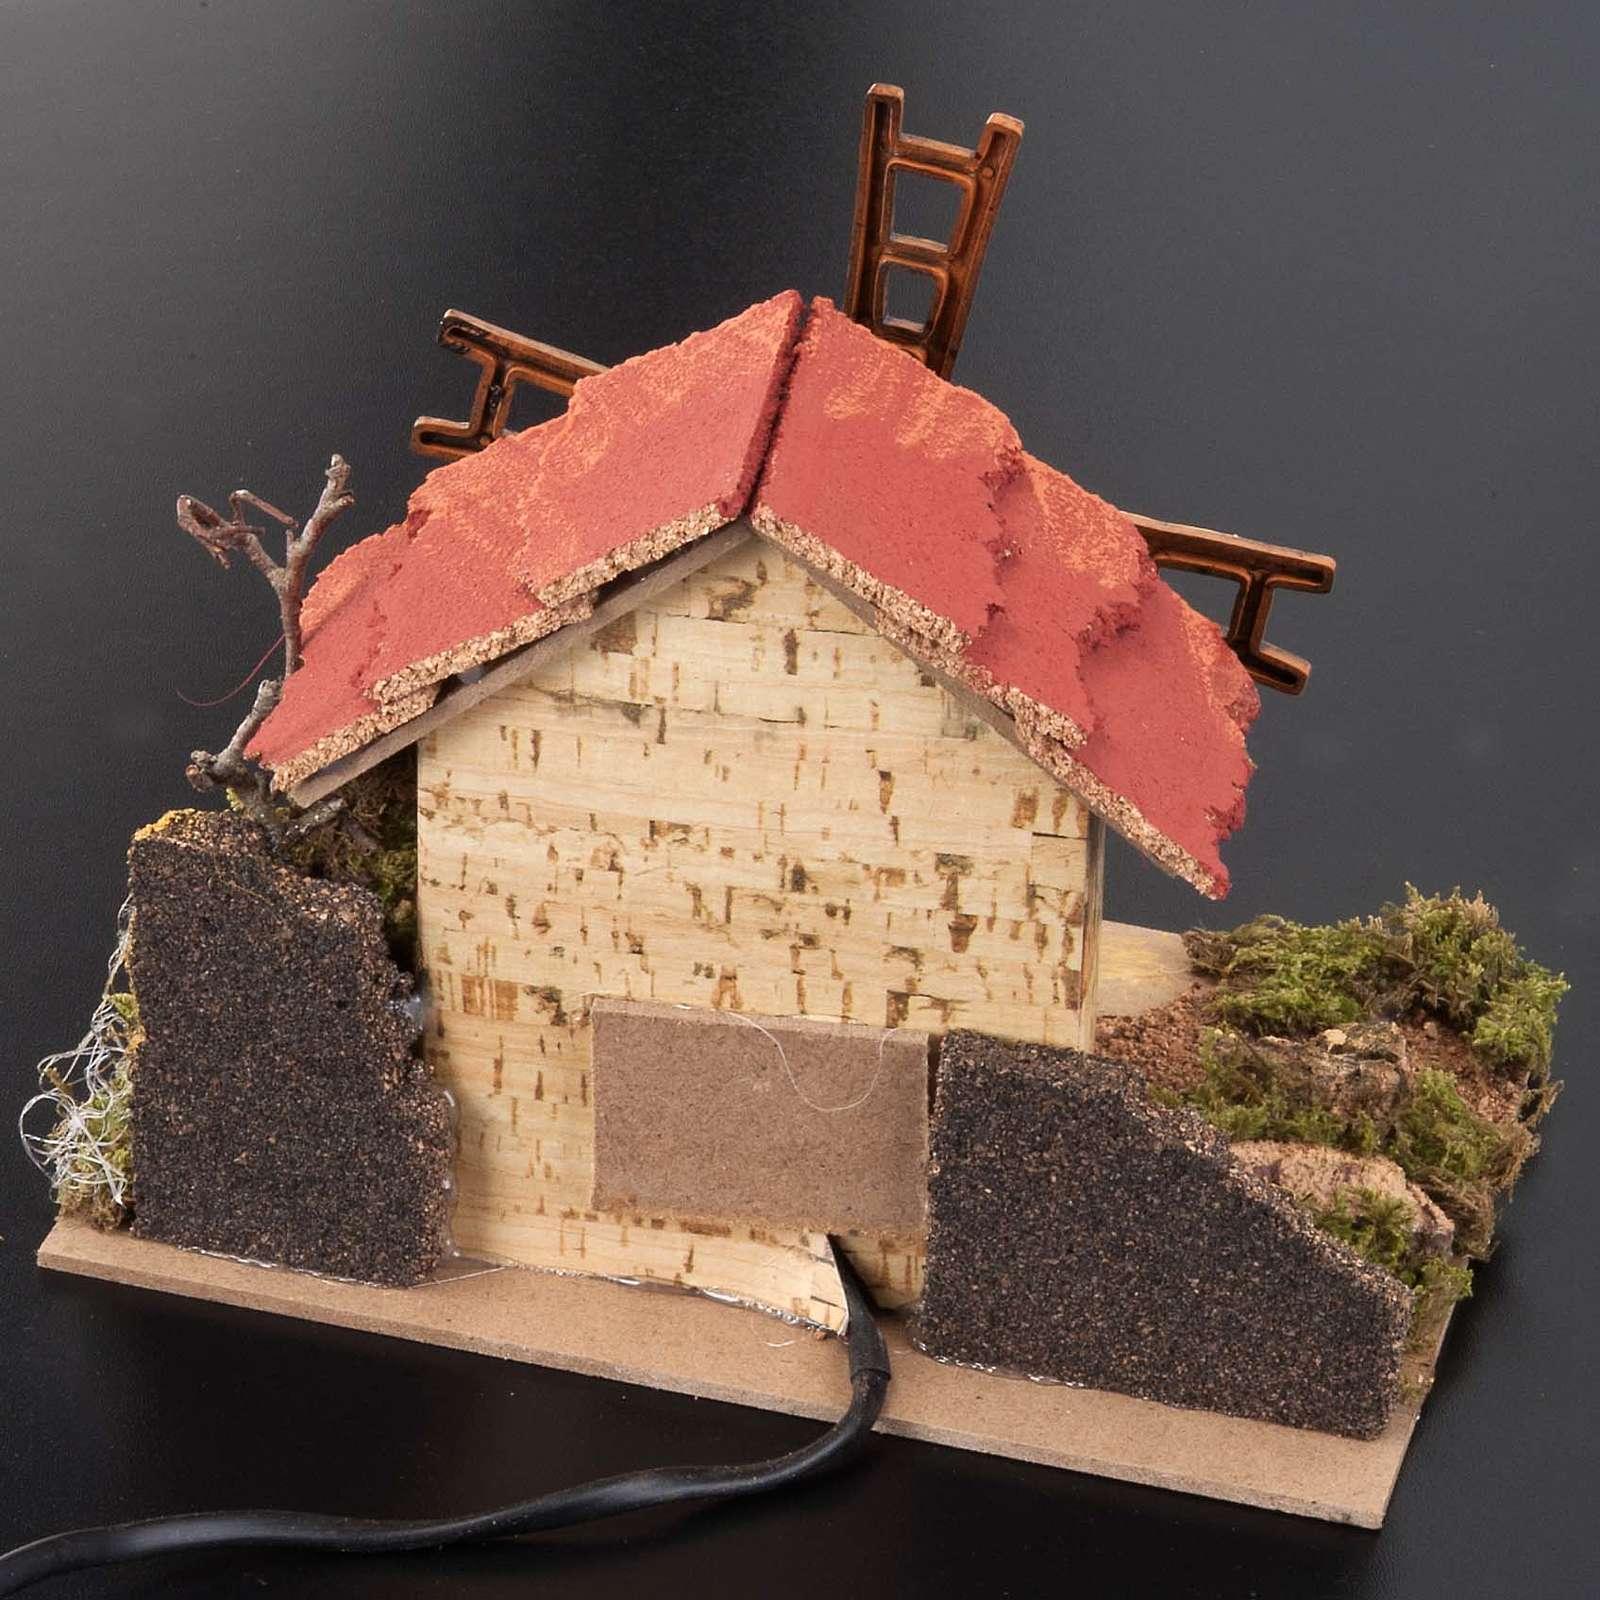 Mini moulin à vent crèche Noel 20x14 cm 4